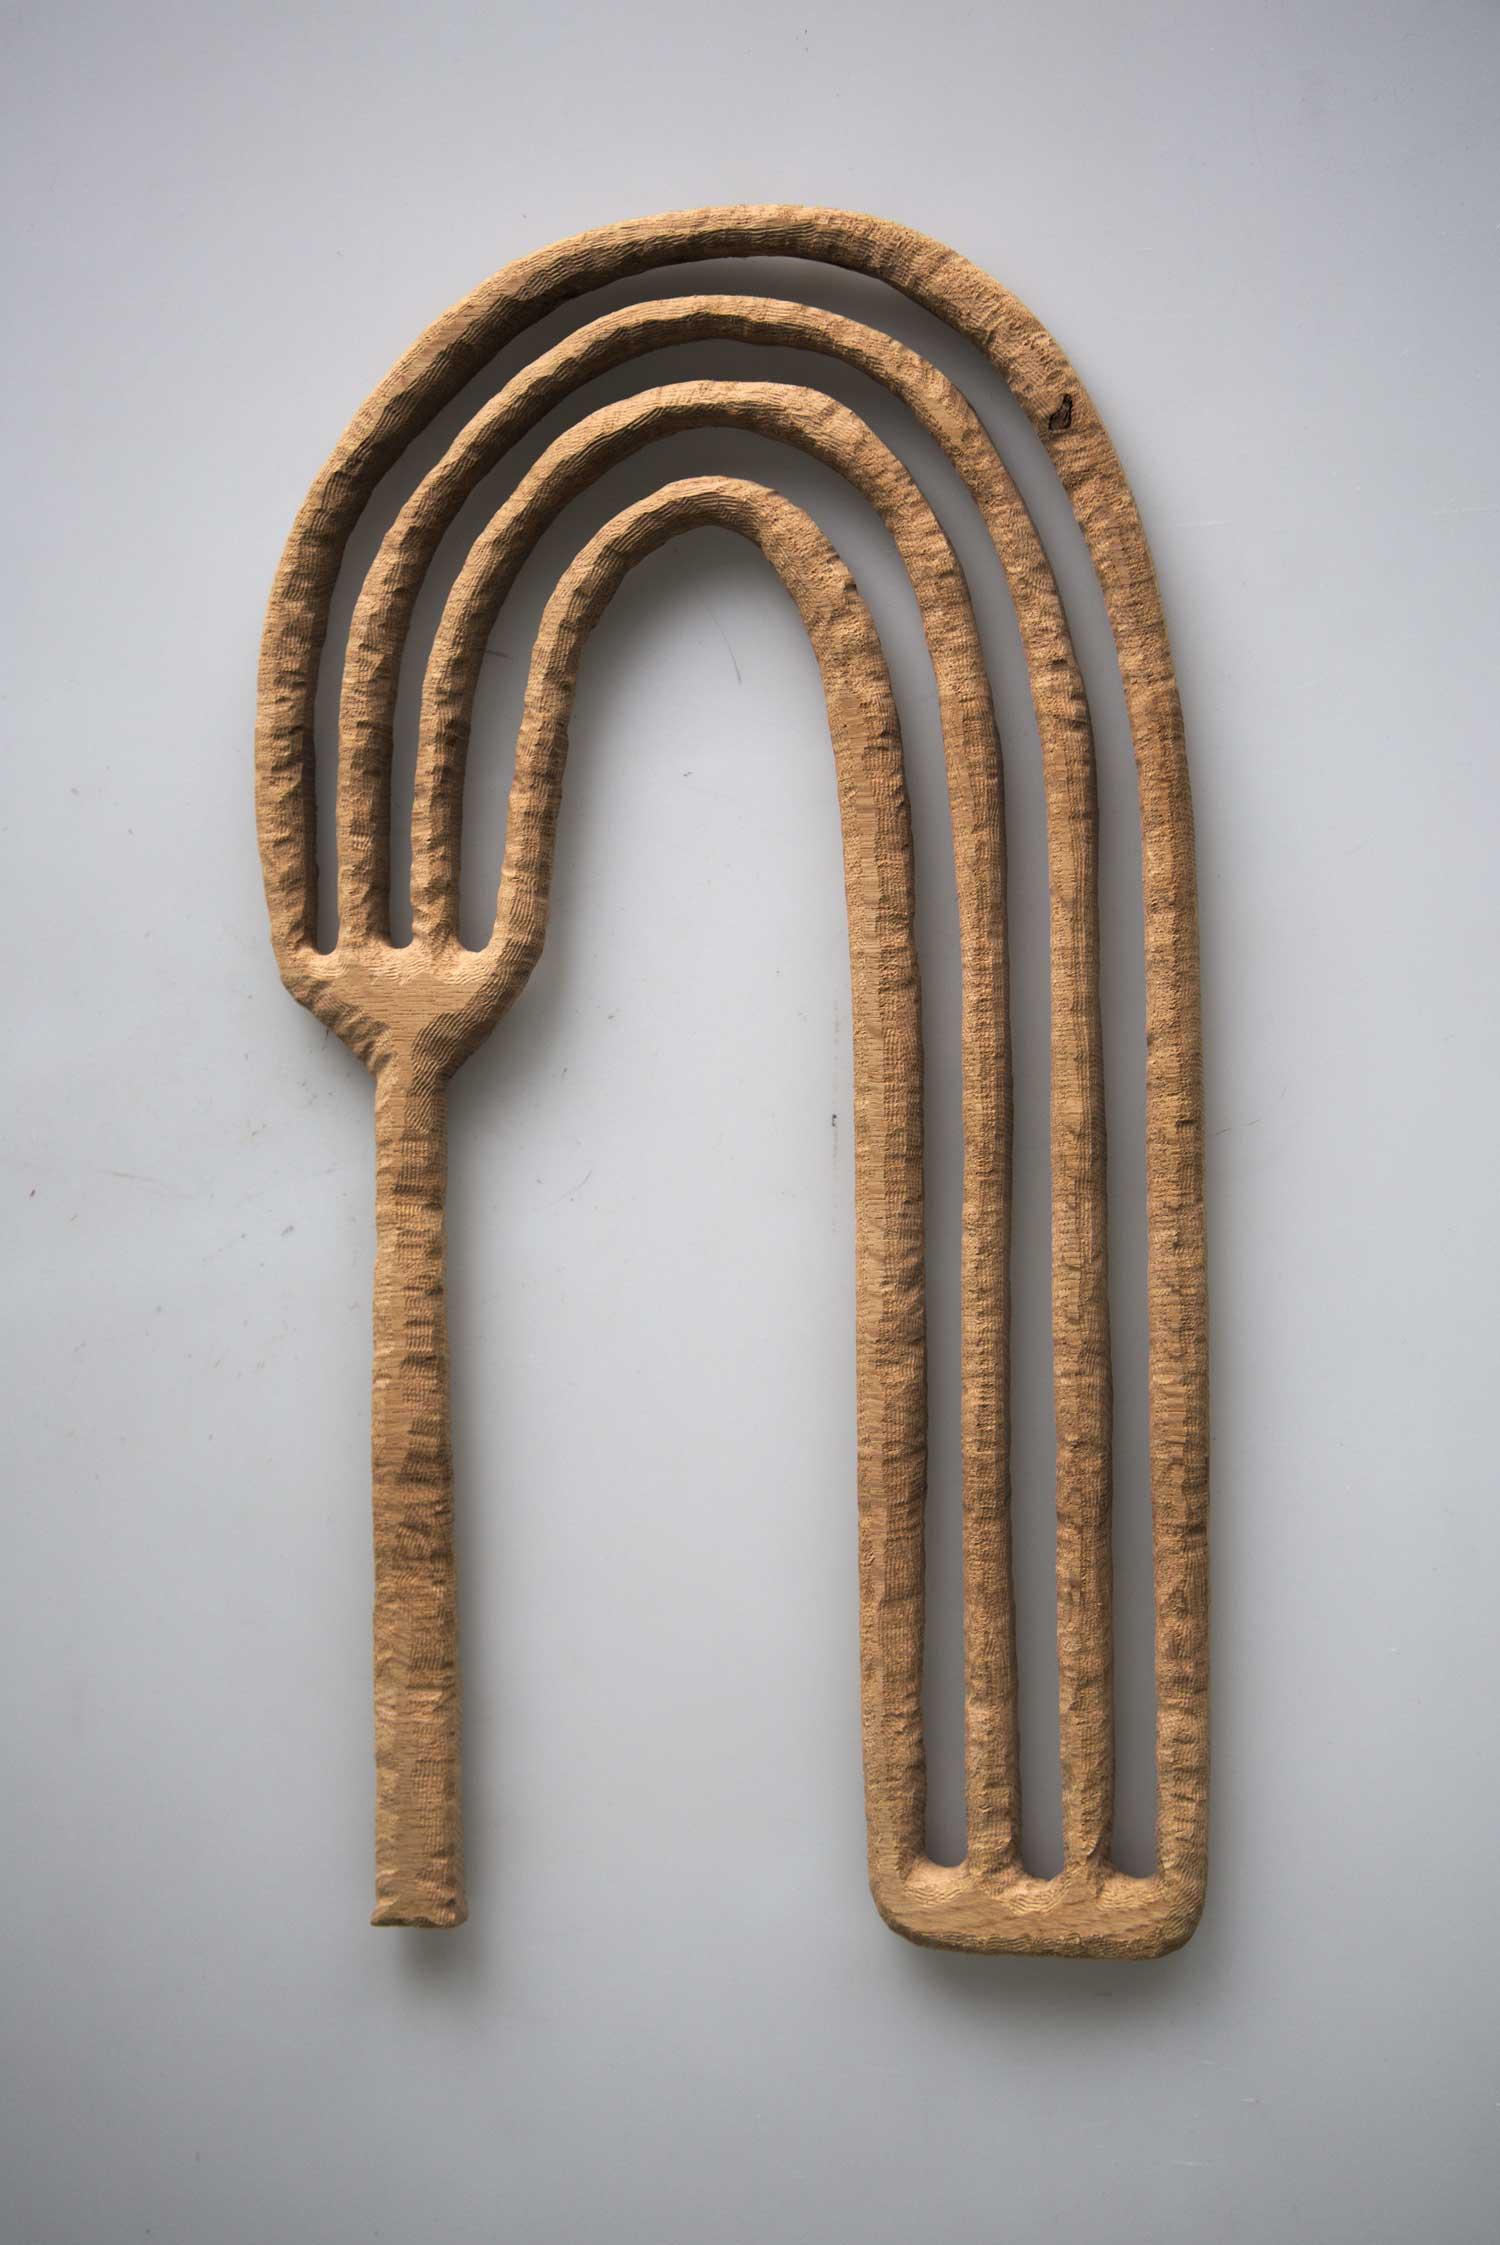 David Bernstein Reinterprets Cutlery for Valerie Objects | Yellowtrace